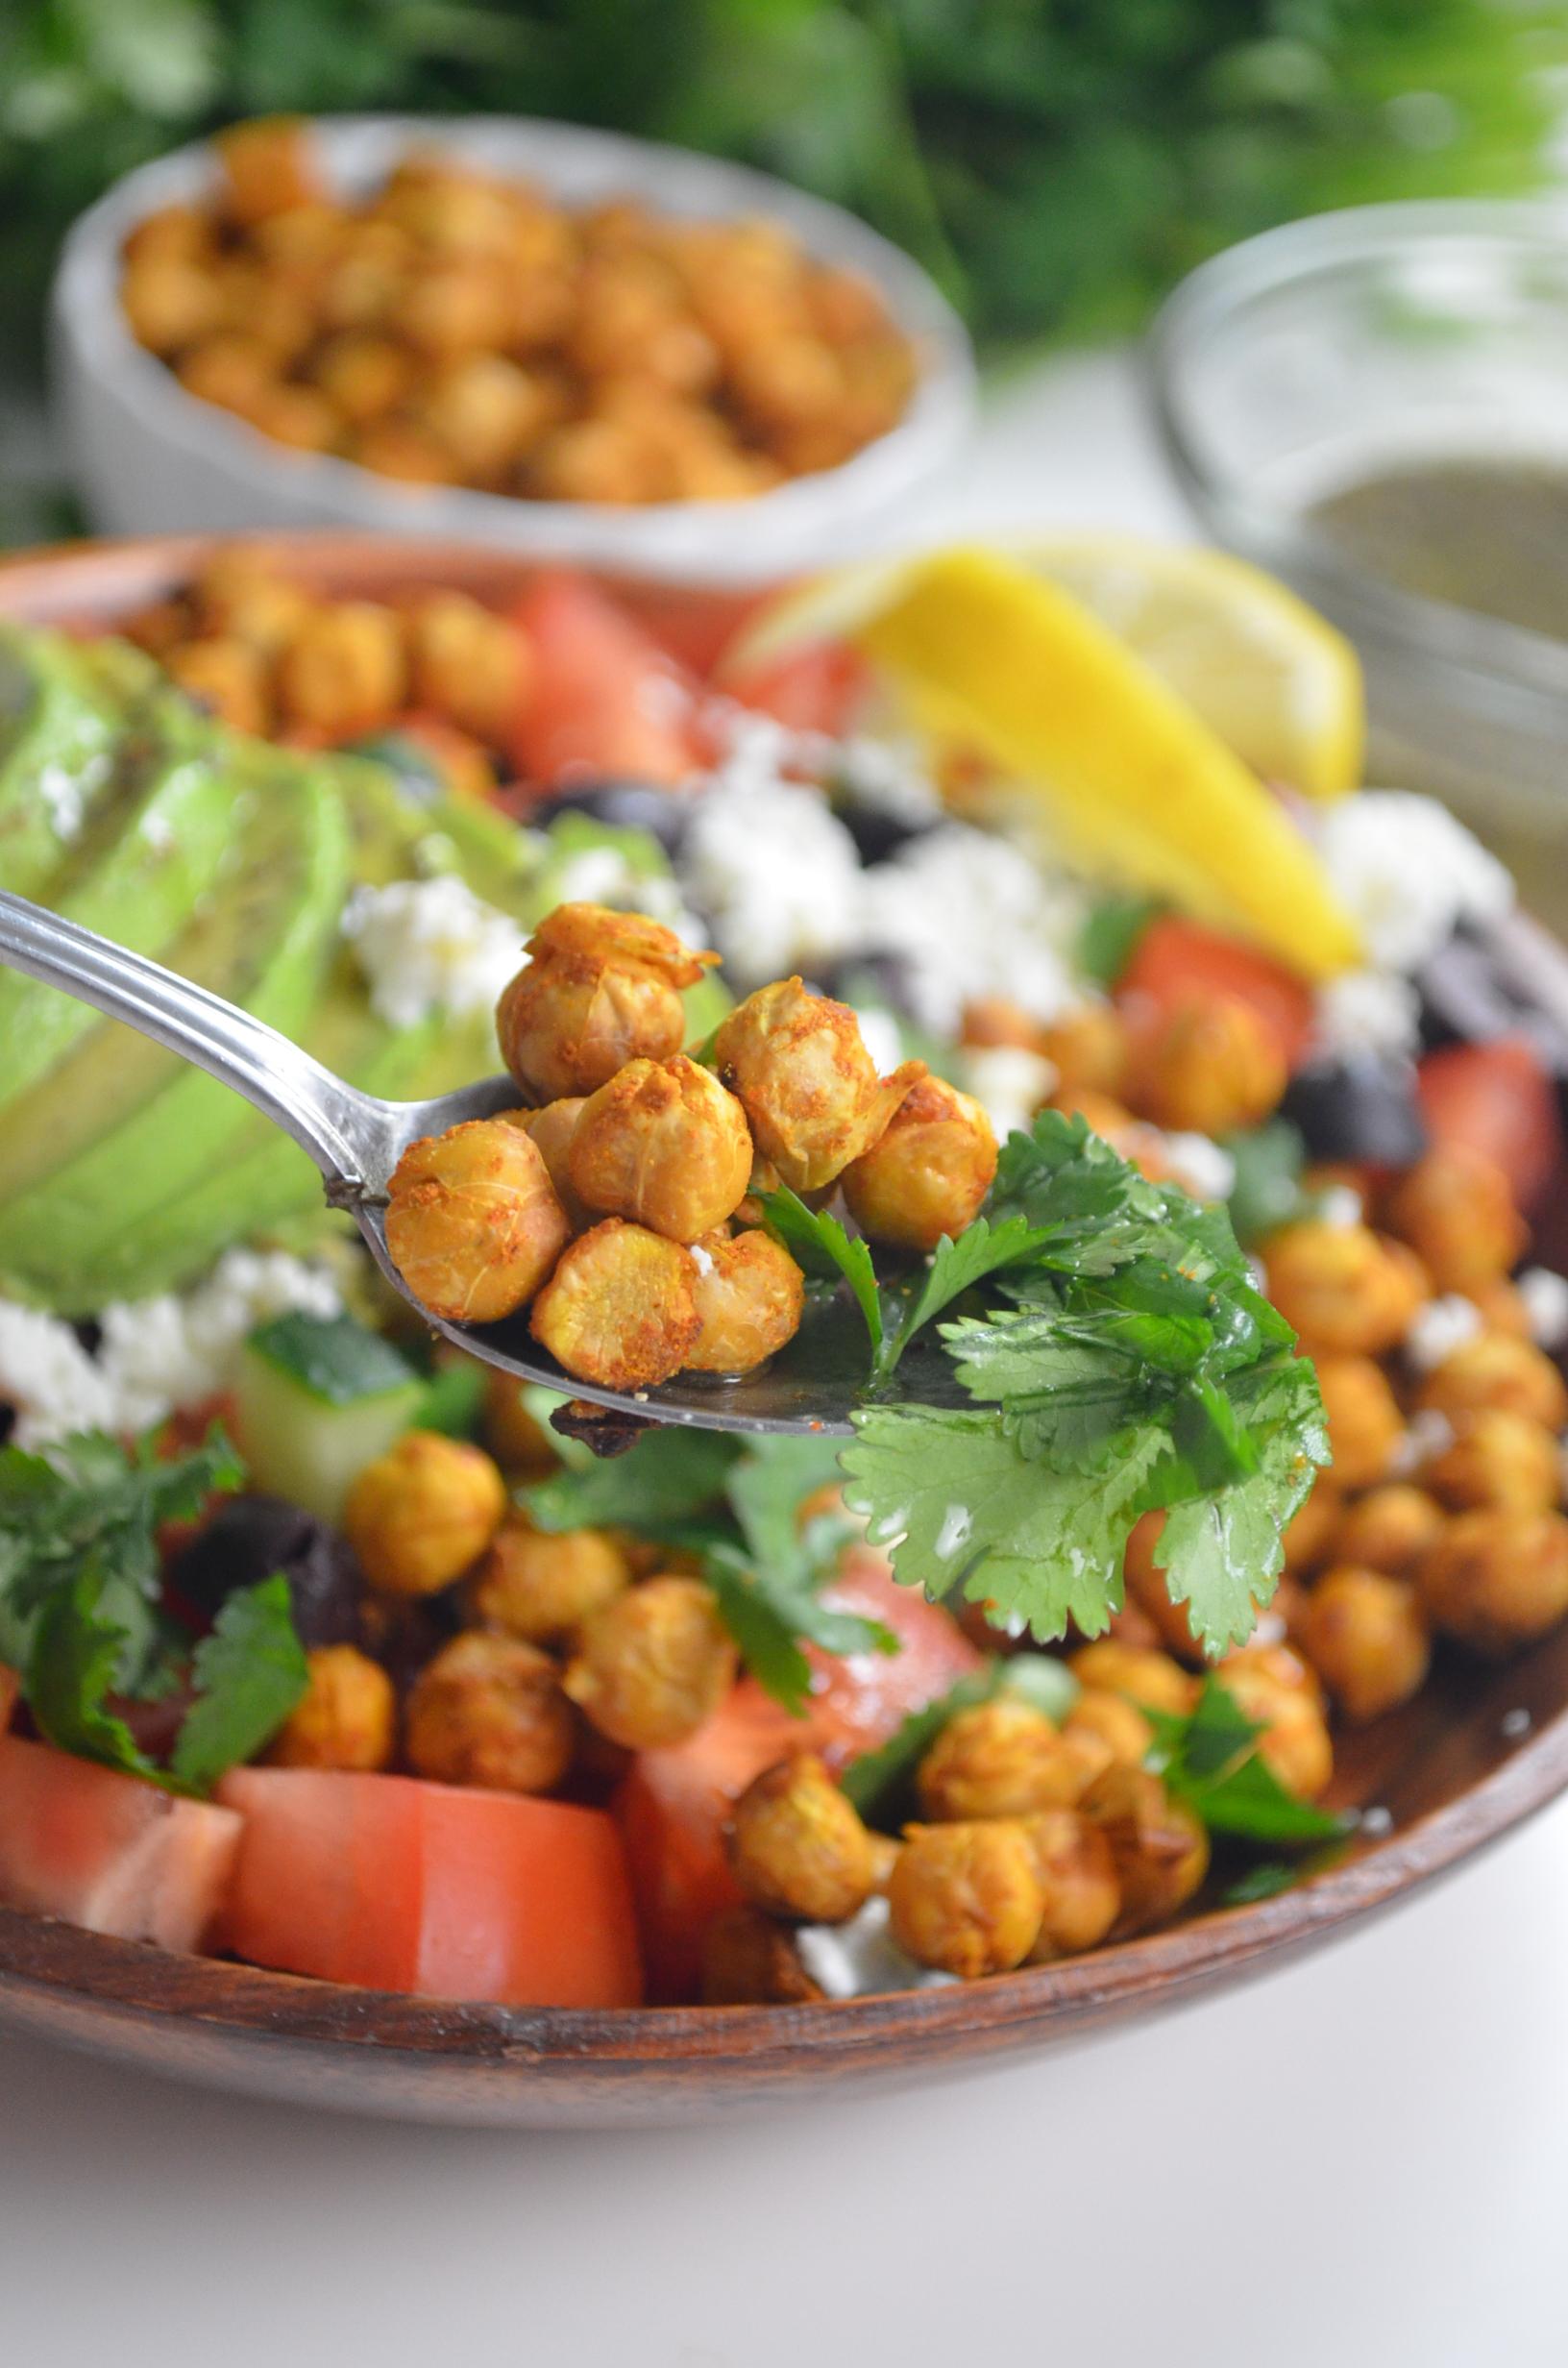 Chickpeas and Quinoa Salad